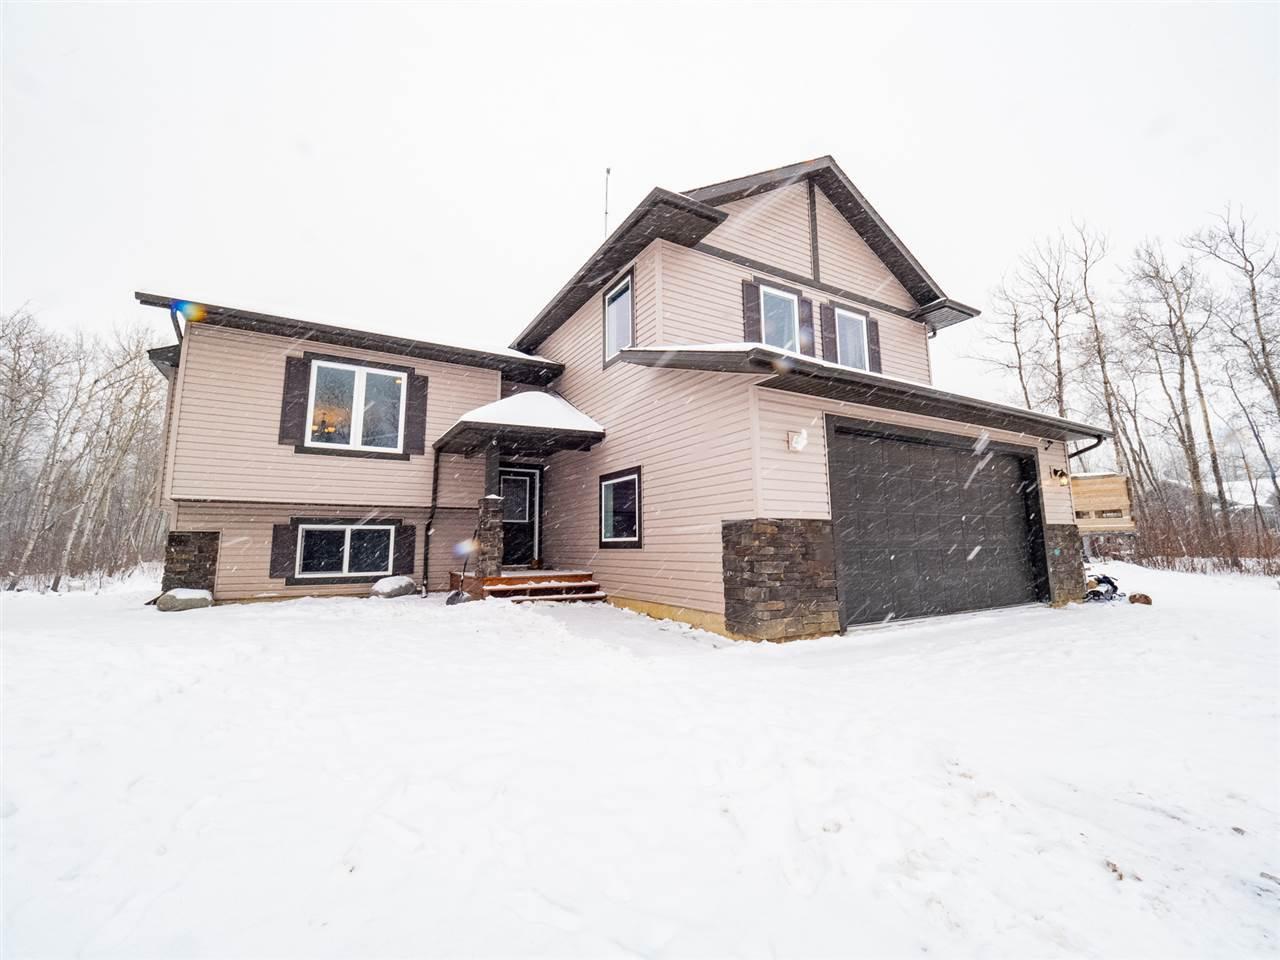 Main Photo: 48 51504 Range Road 200: Rural Beaver County House for sale : MLS®# E4221424